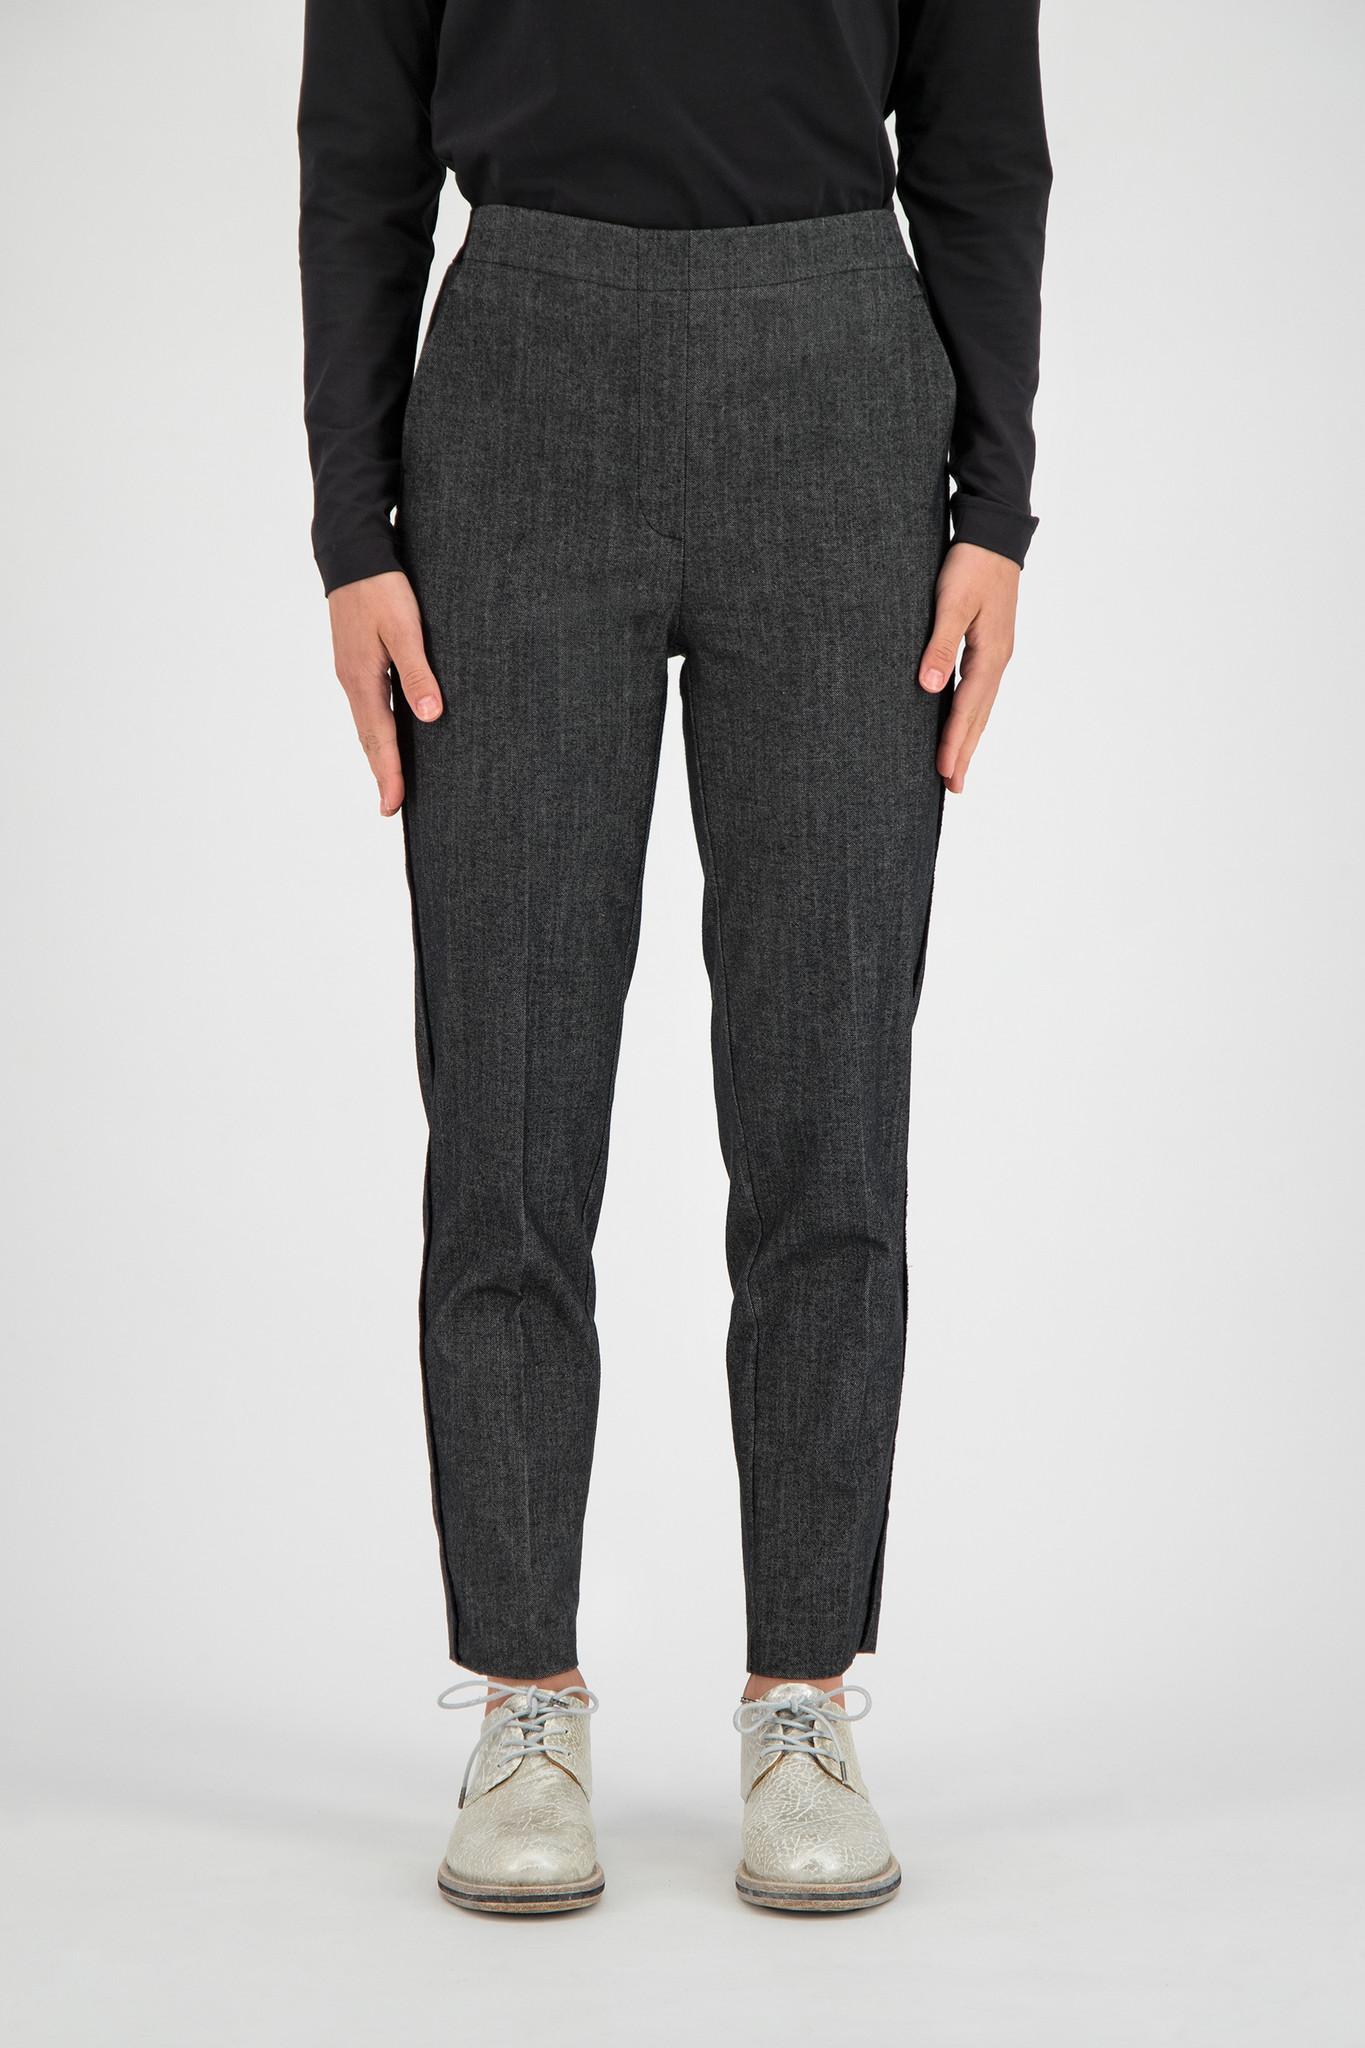 SYLVER Denim Trousers - Black